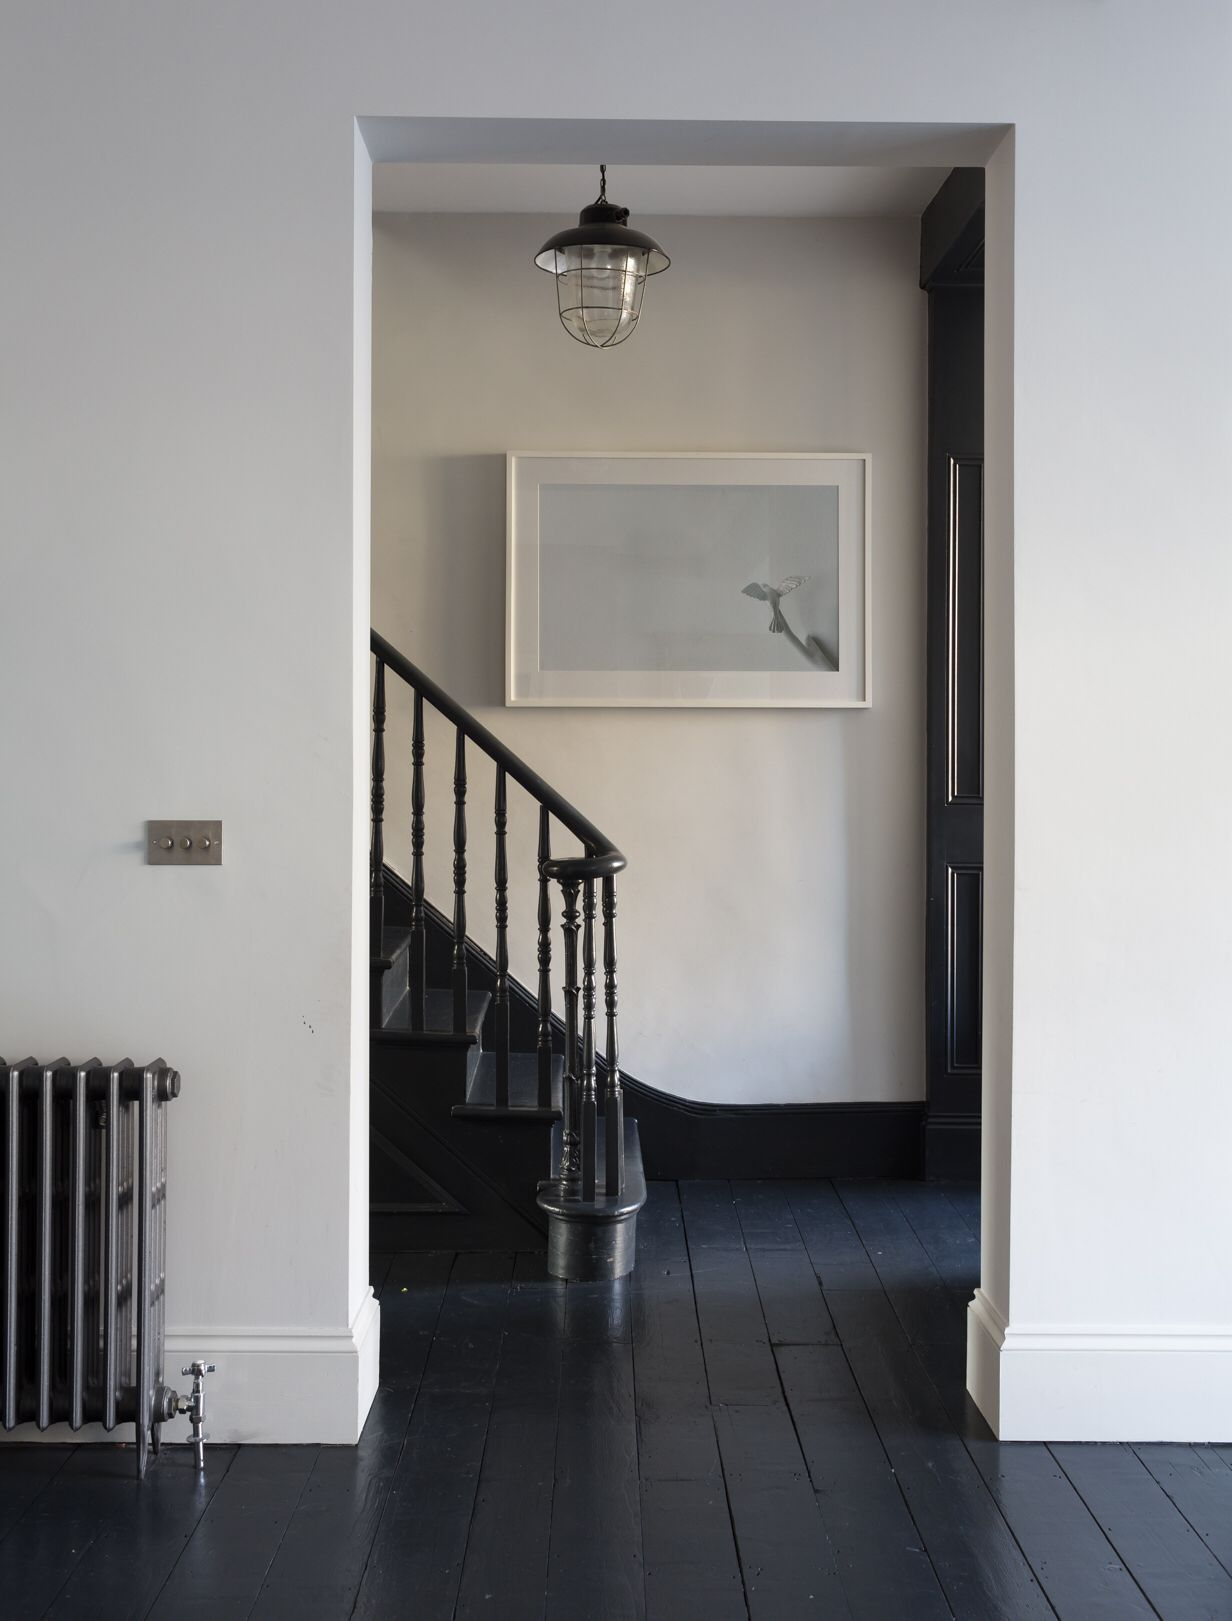 houtenvloeren#zwart   maison   pinterest   parquet, peindre et